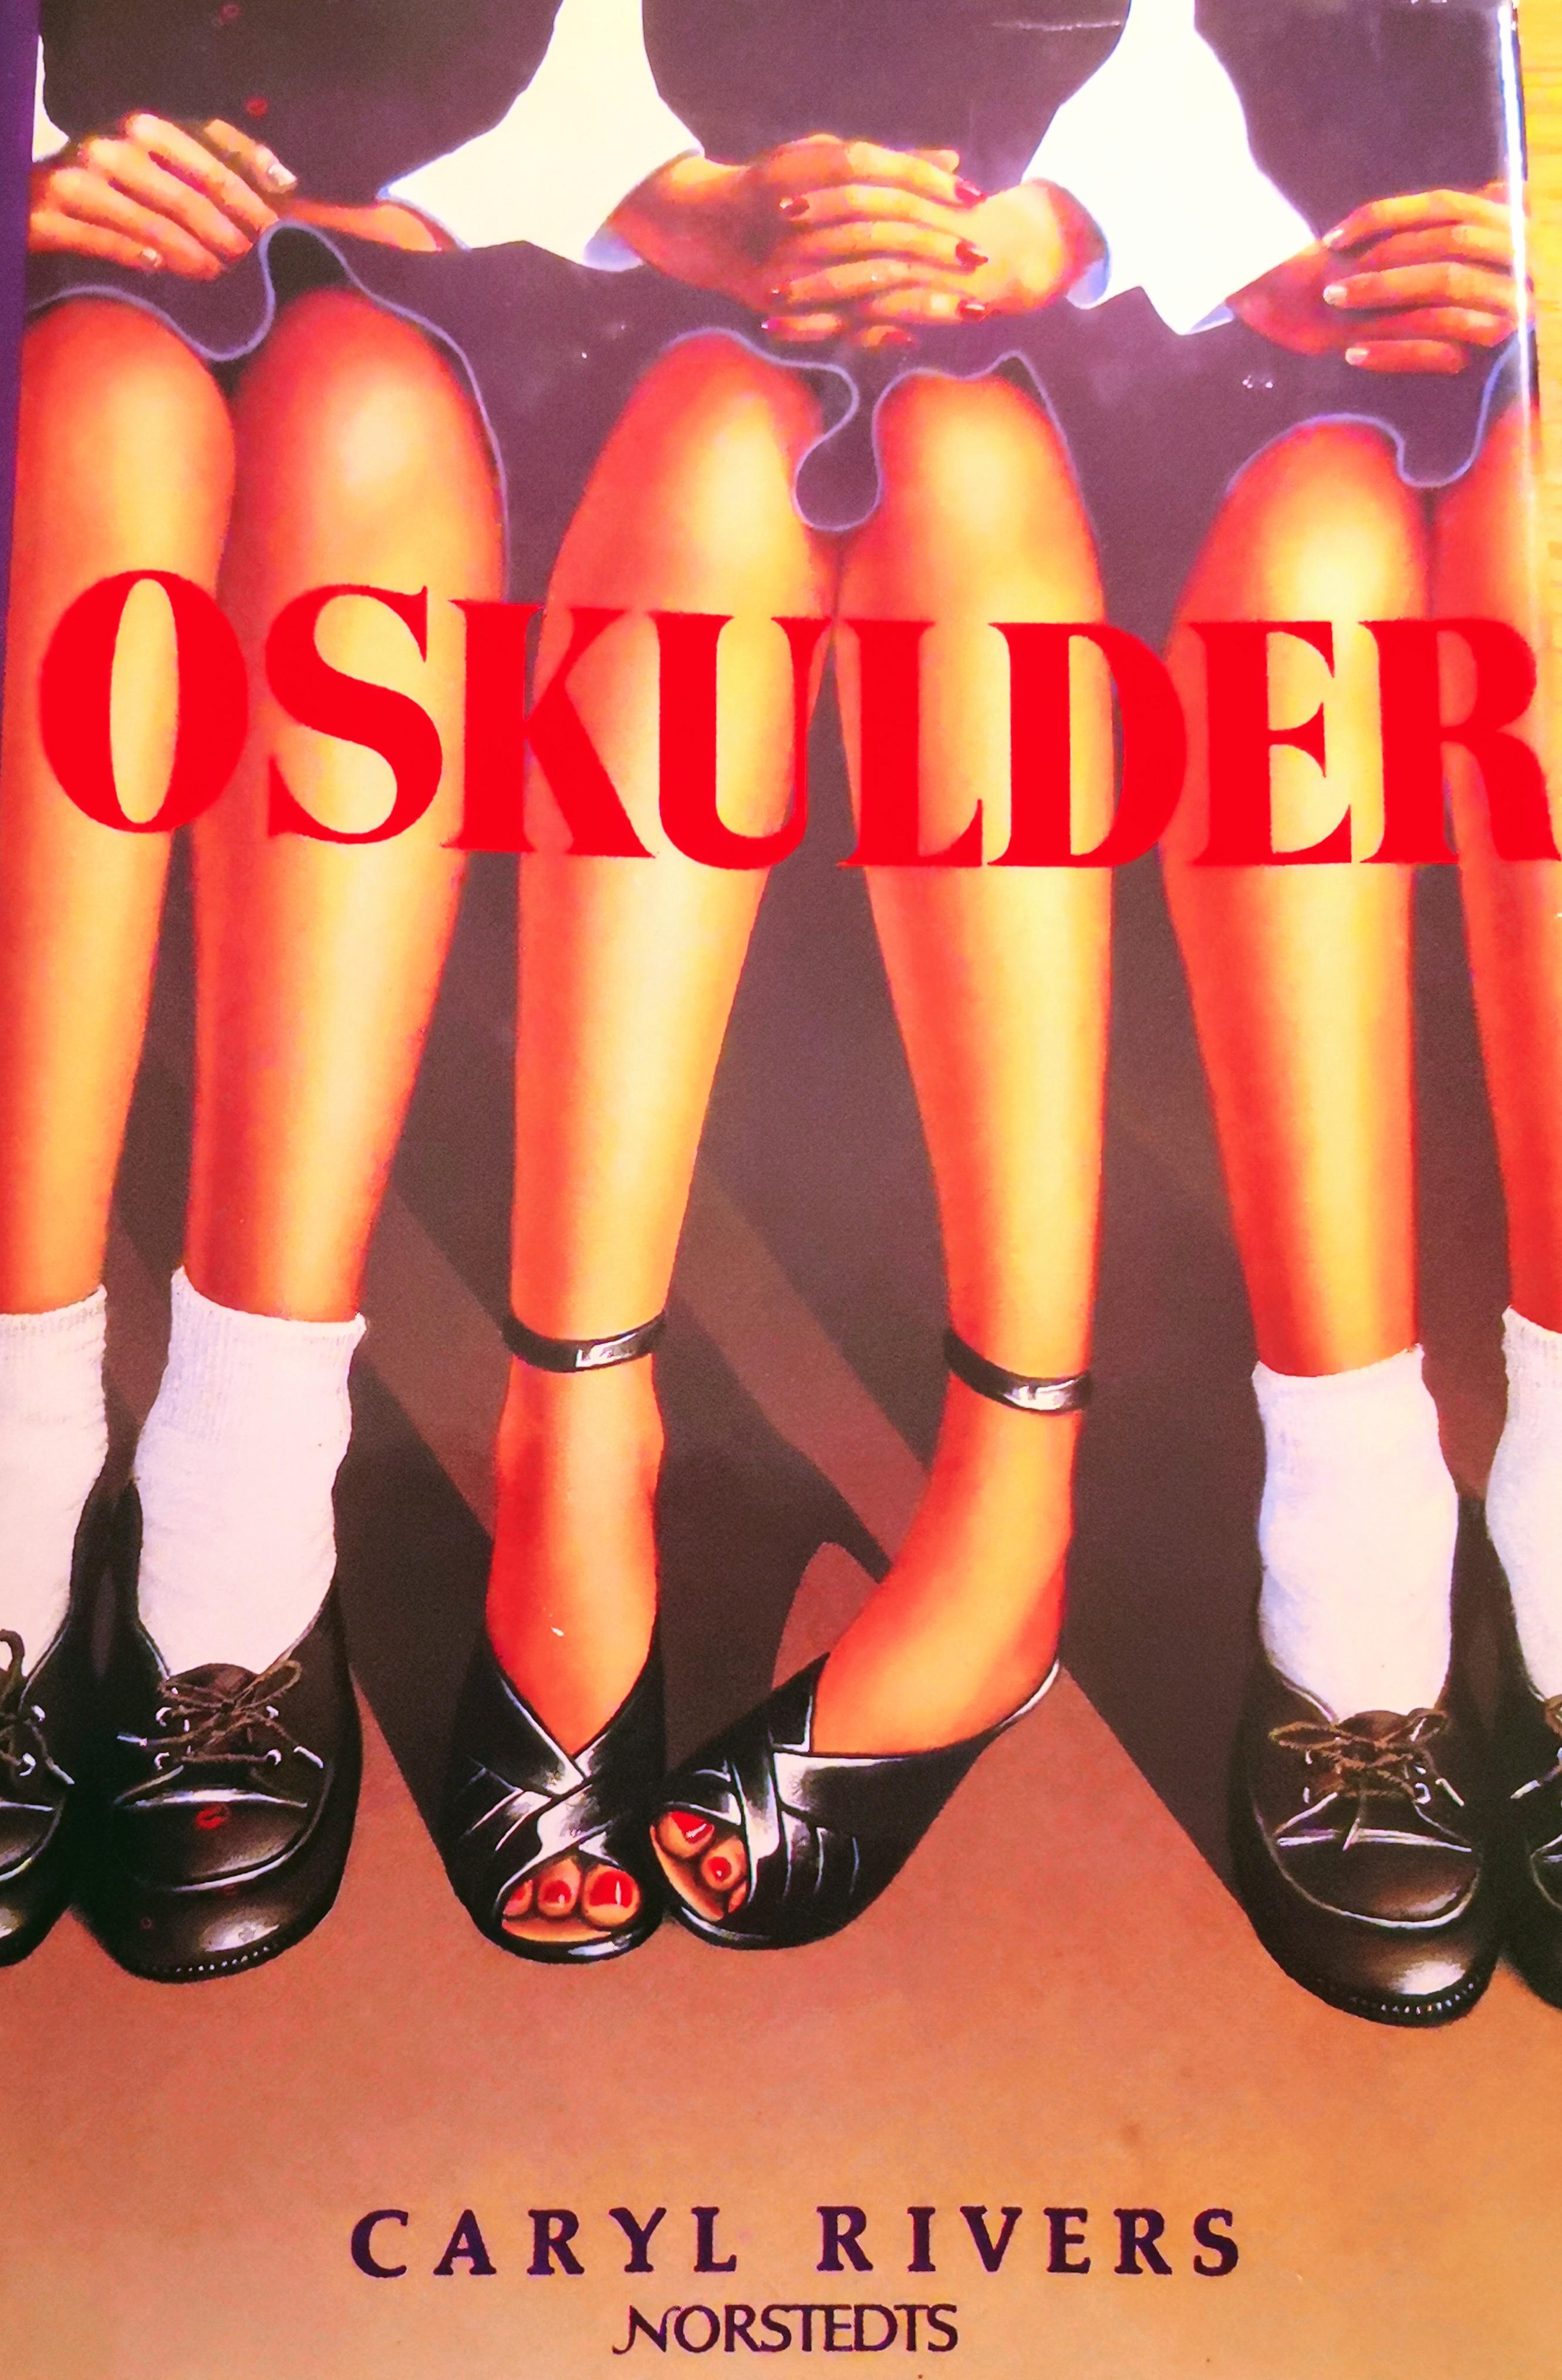 Caryl Rivers : 'Oskulder'